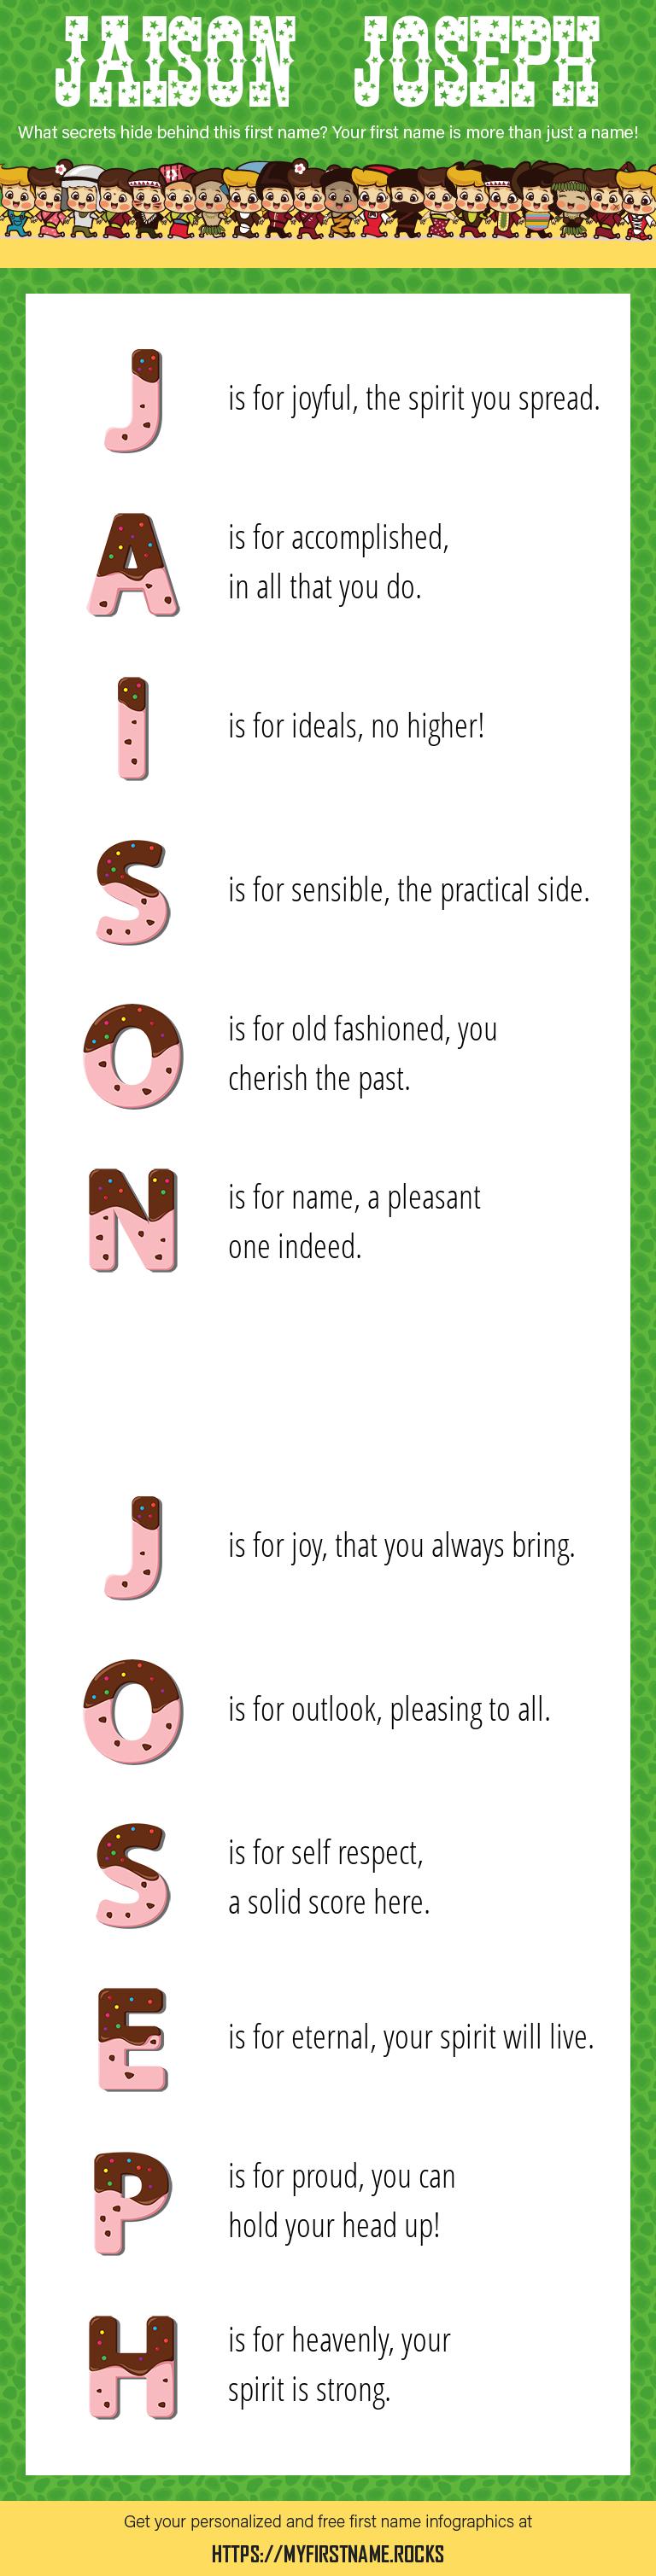 Jaison Joseph Infographics